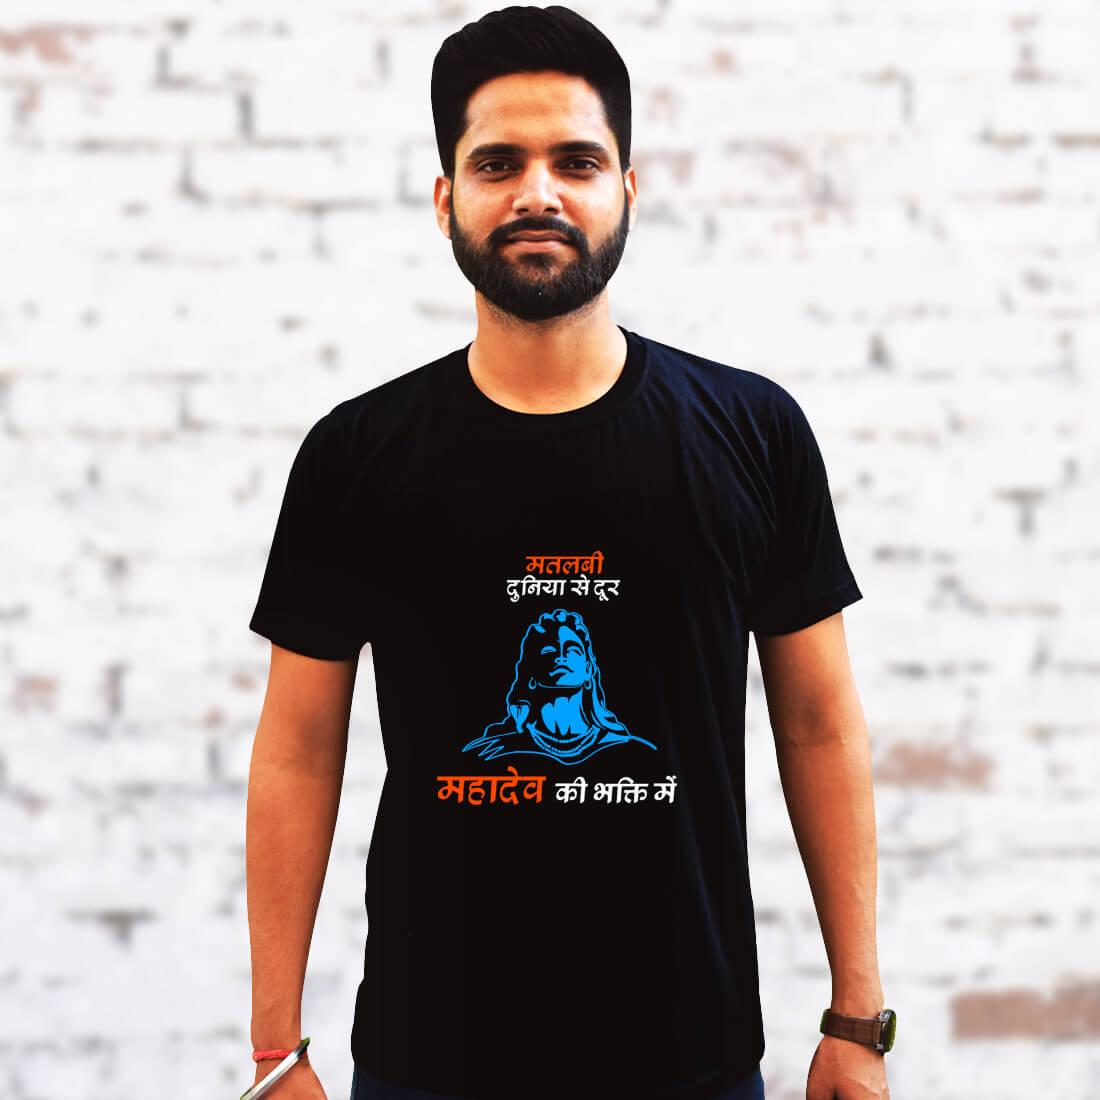 Mahadev Quotes on Life Printed Black T-Shirt for Men